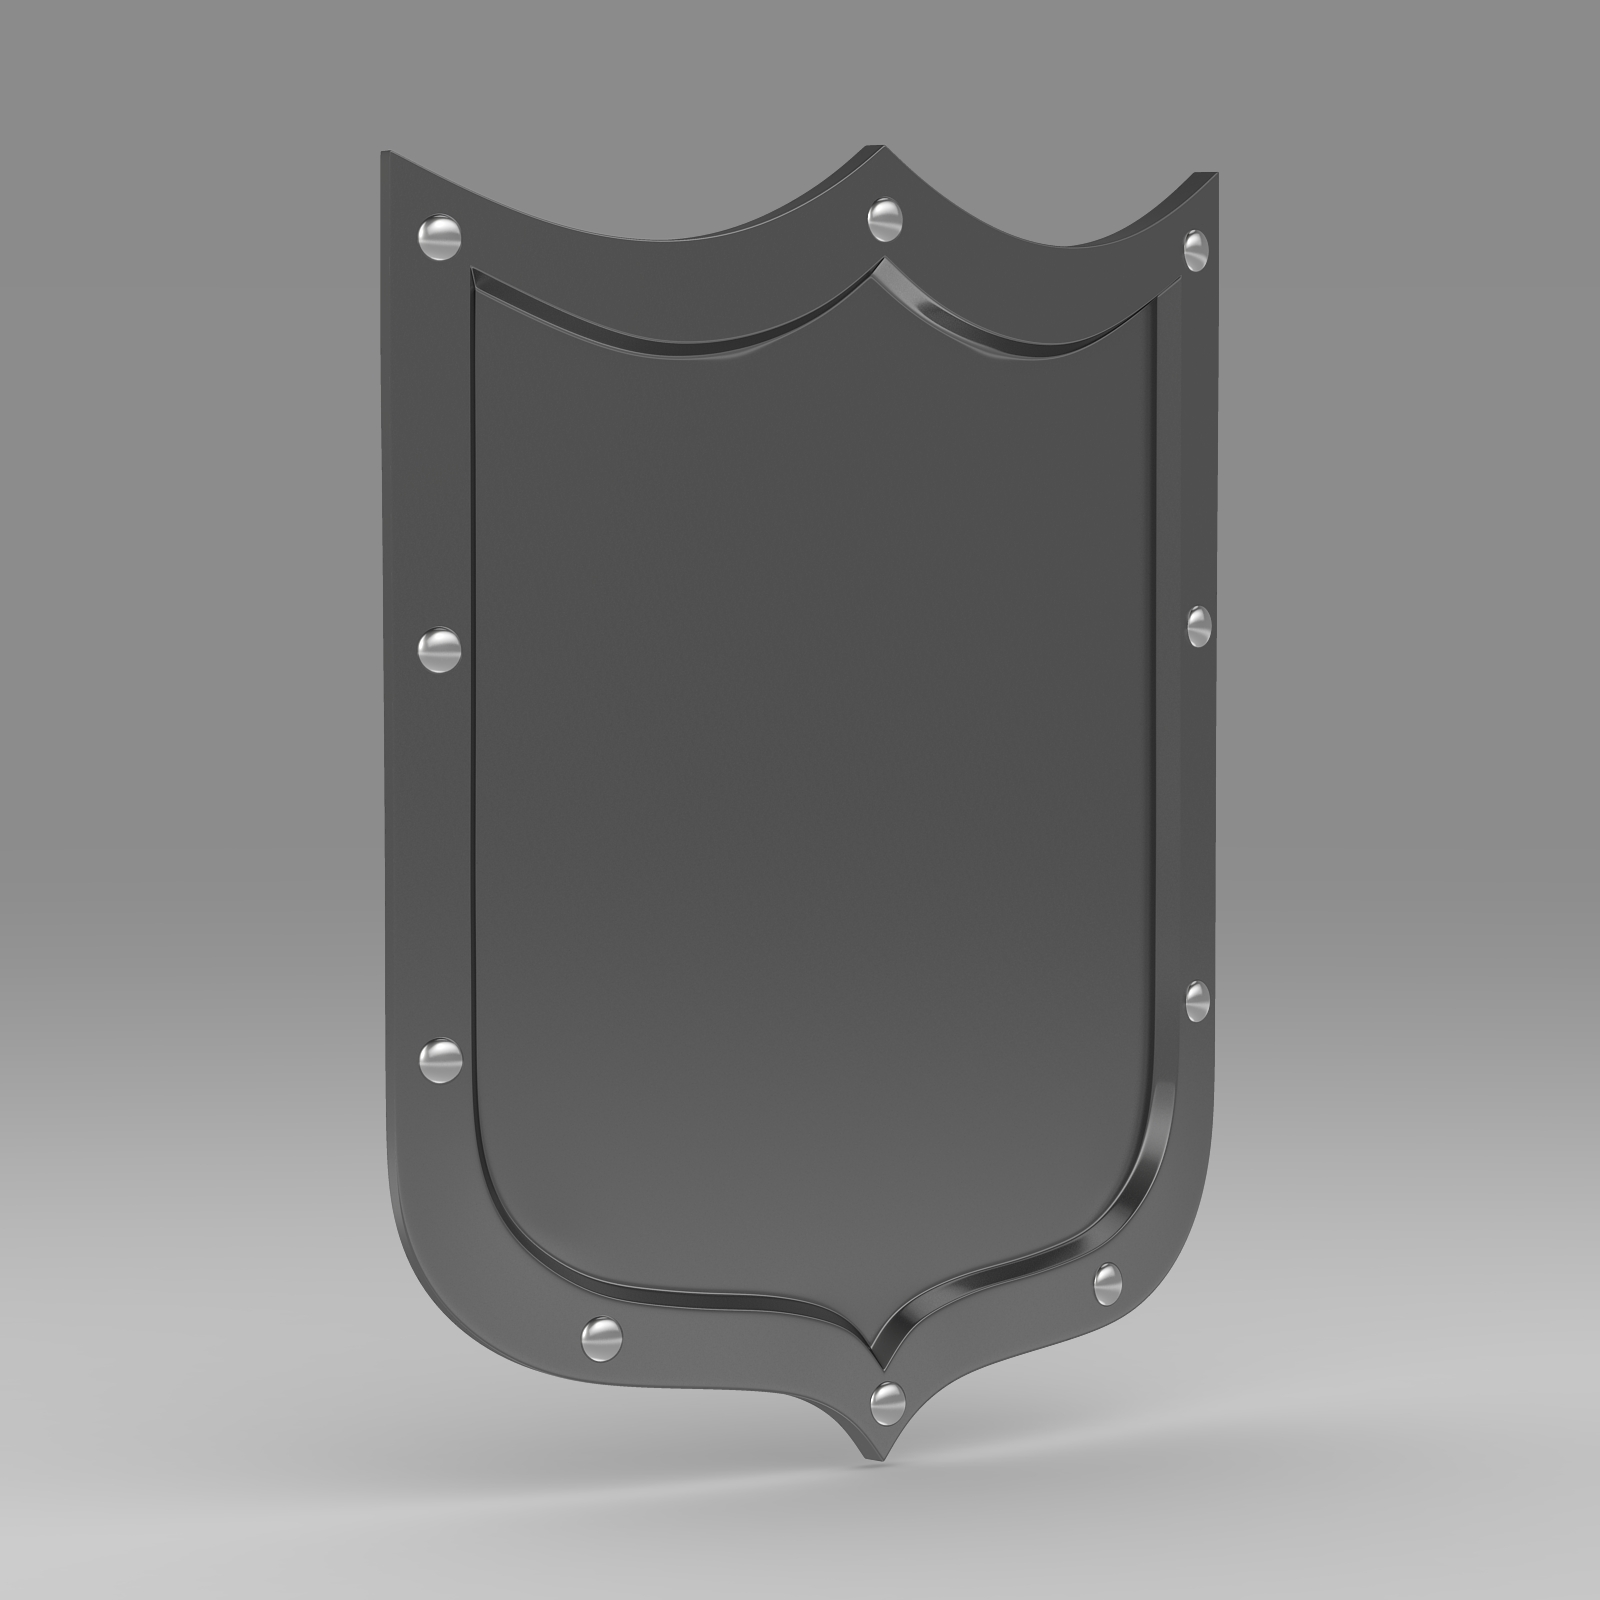 Shield 3 3d model 3ds fbx c4d lwo lws lw ma mb   223664